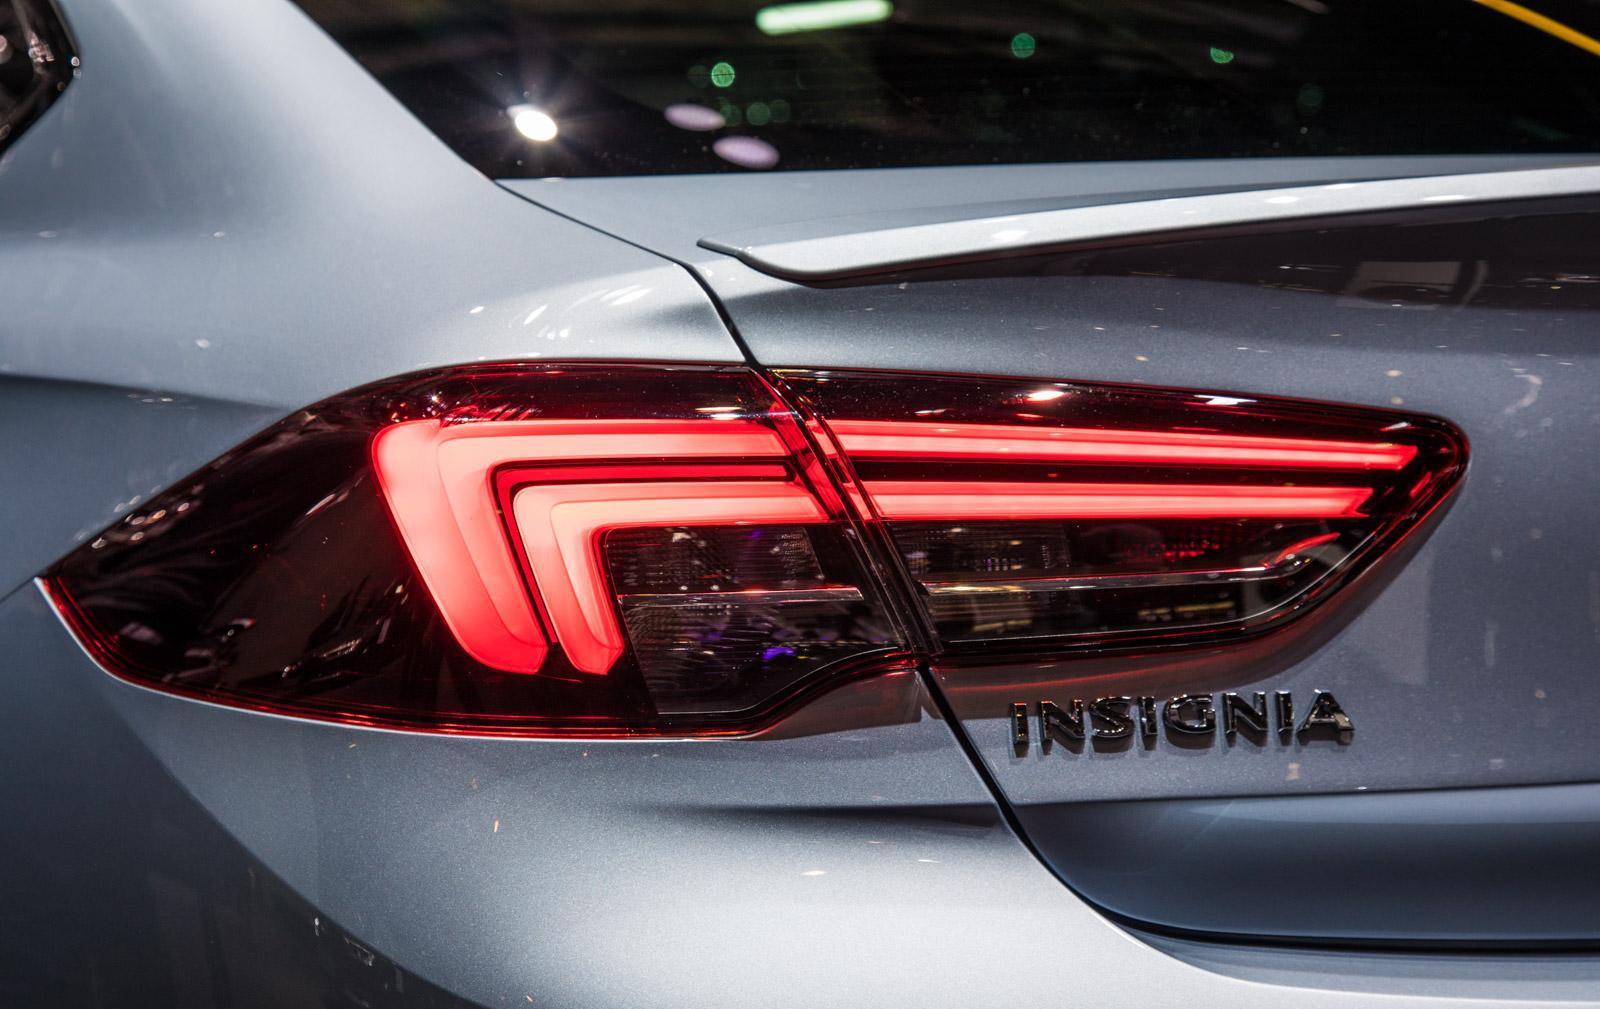 Opel-insignia-013